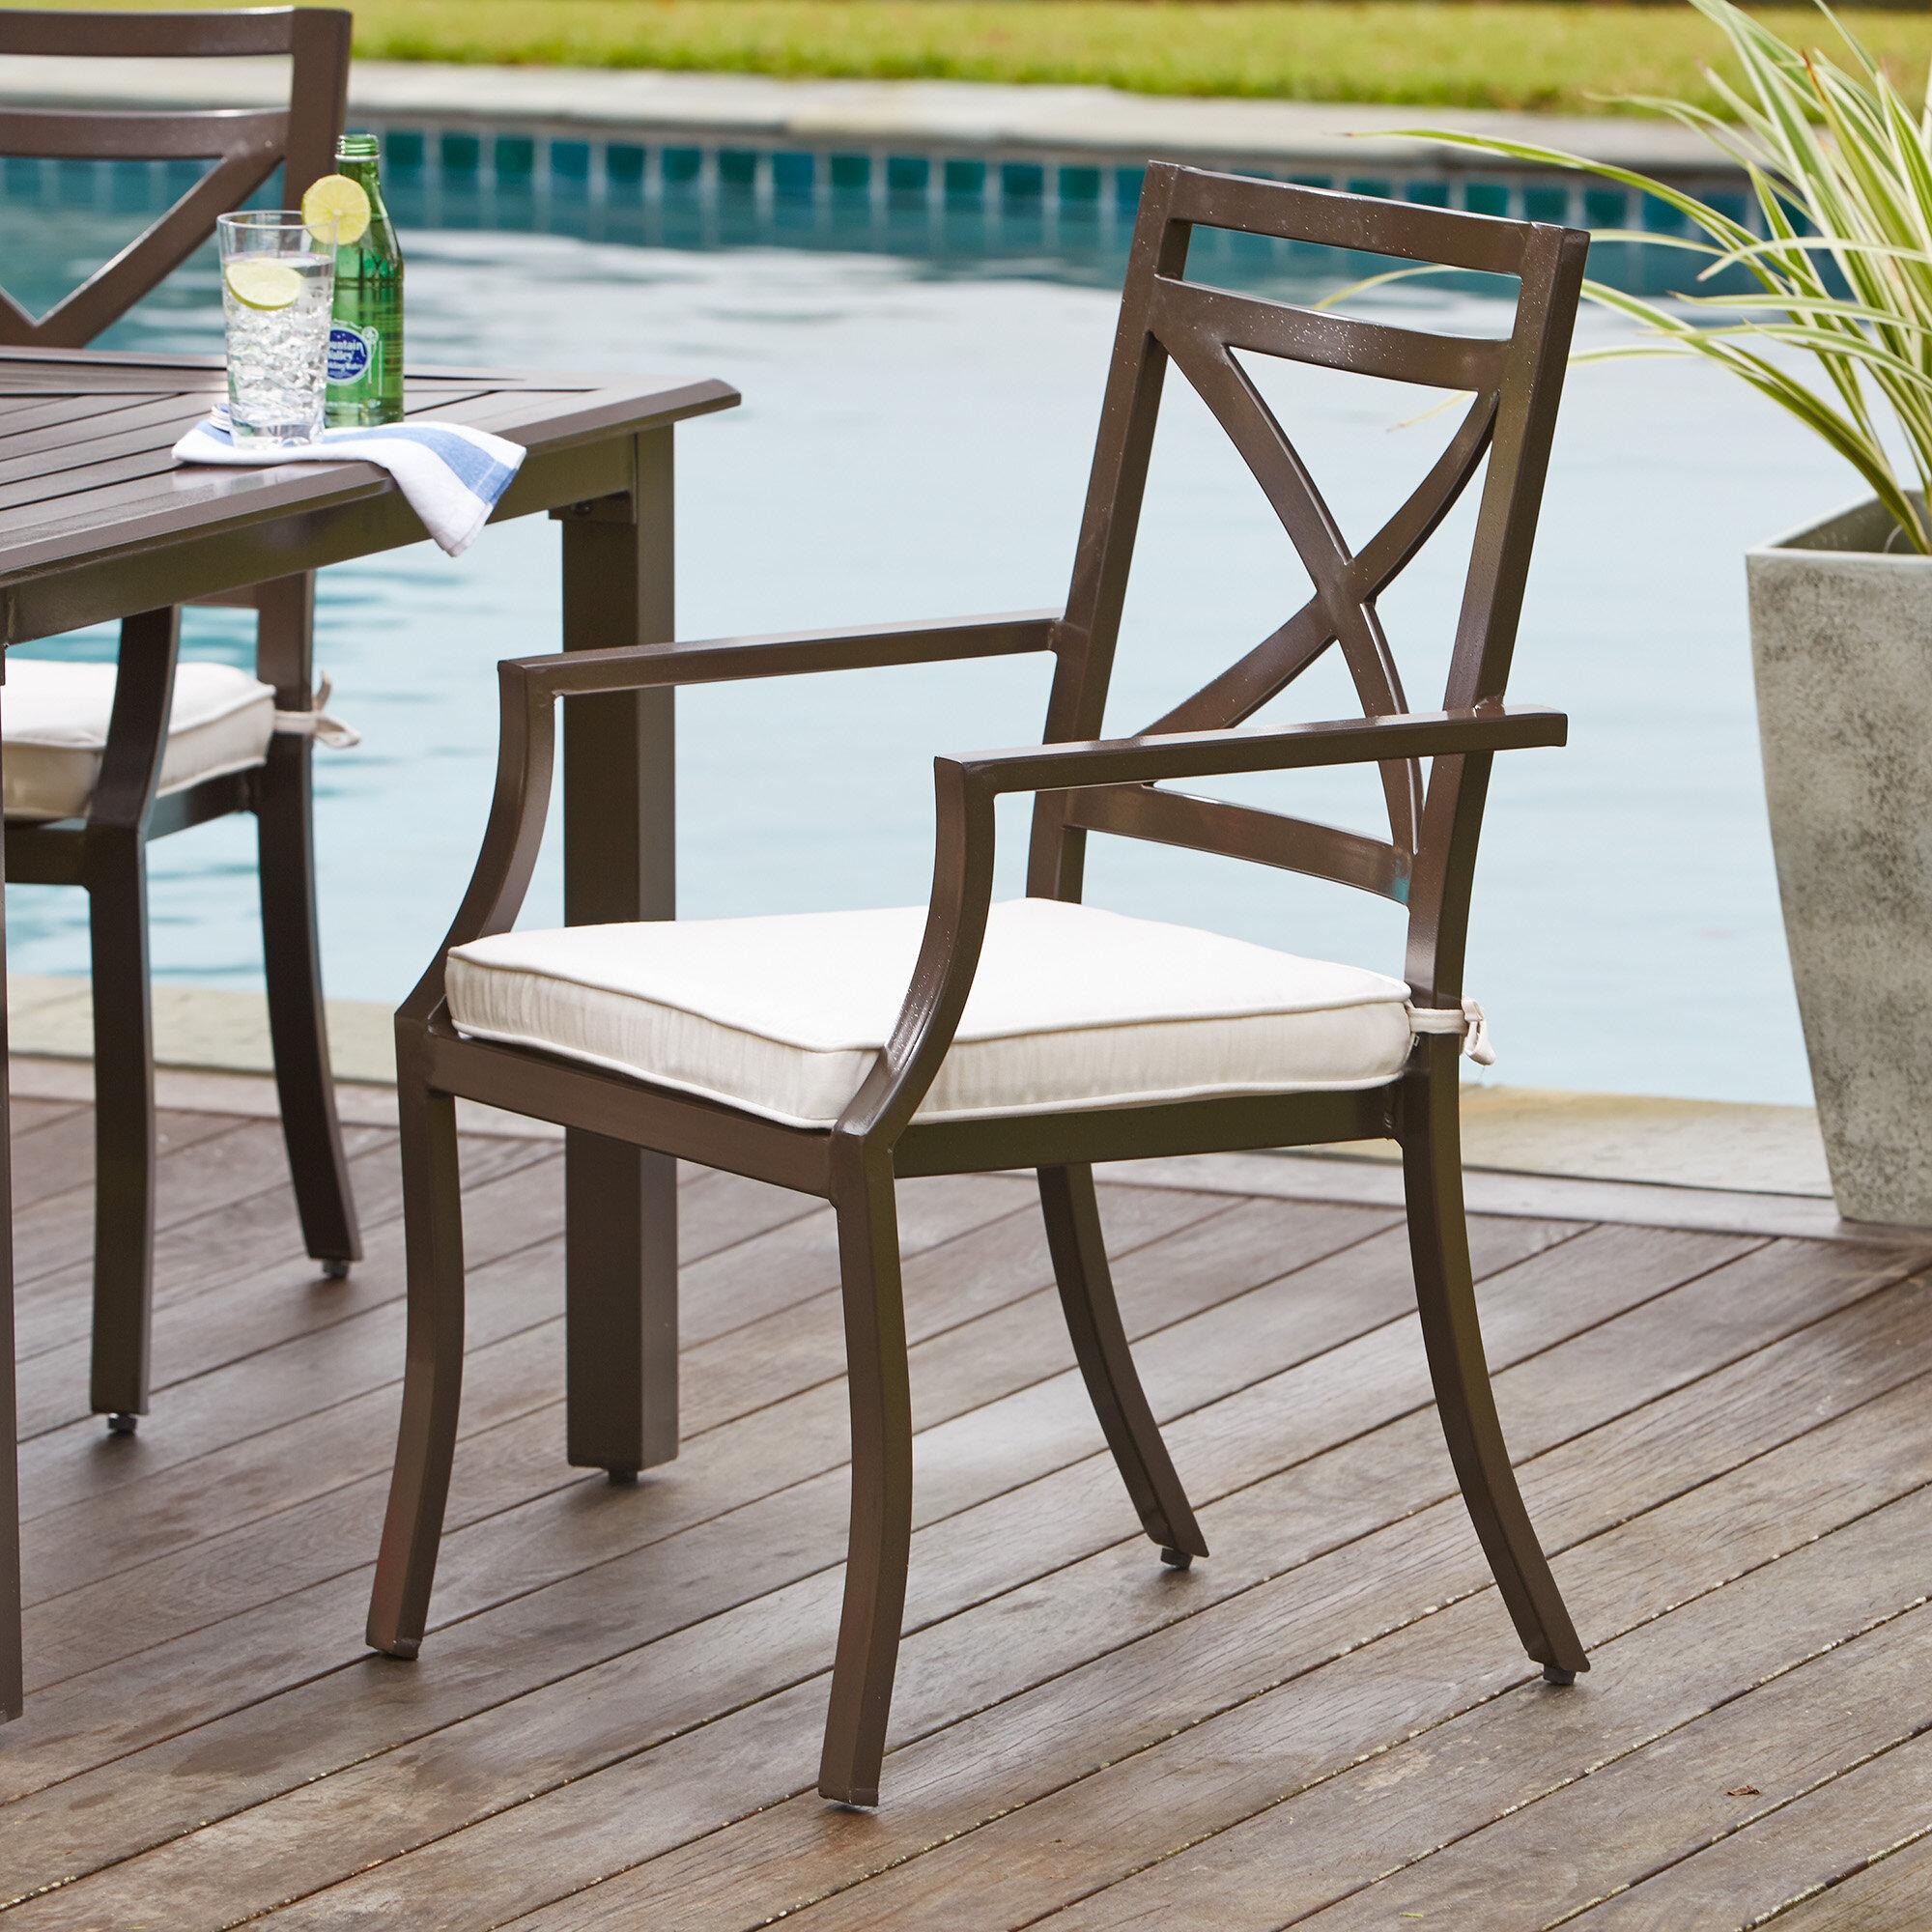 Birch Lane™ Endicott Stacking Patio Dining Chair With Cushion U0026 Reviews |  Birch Lane